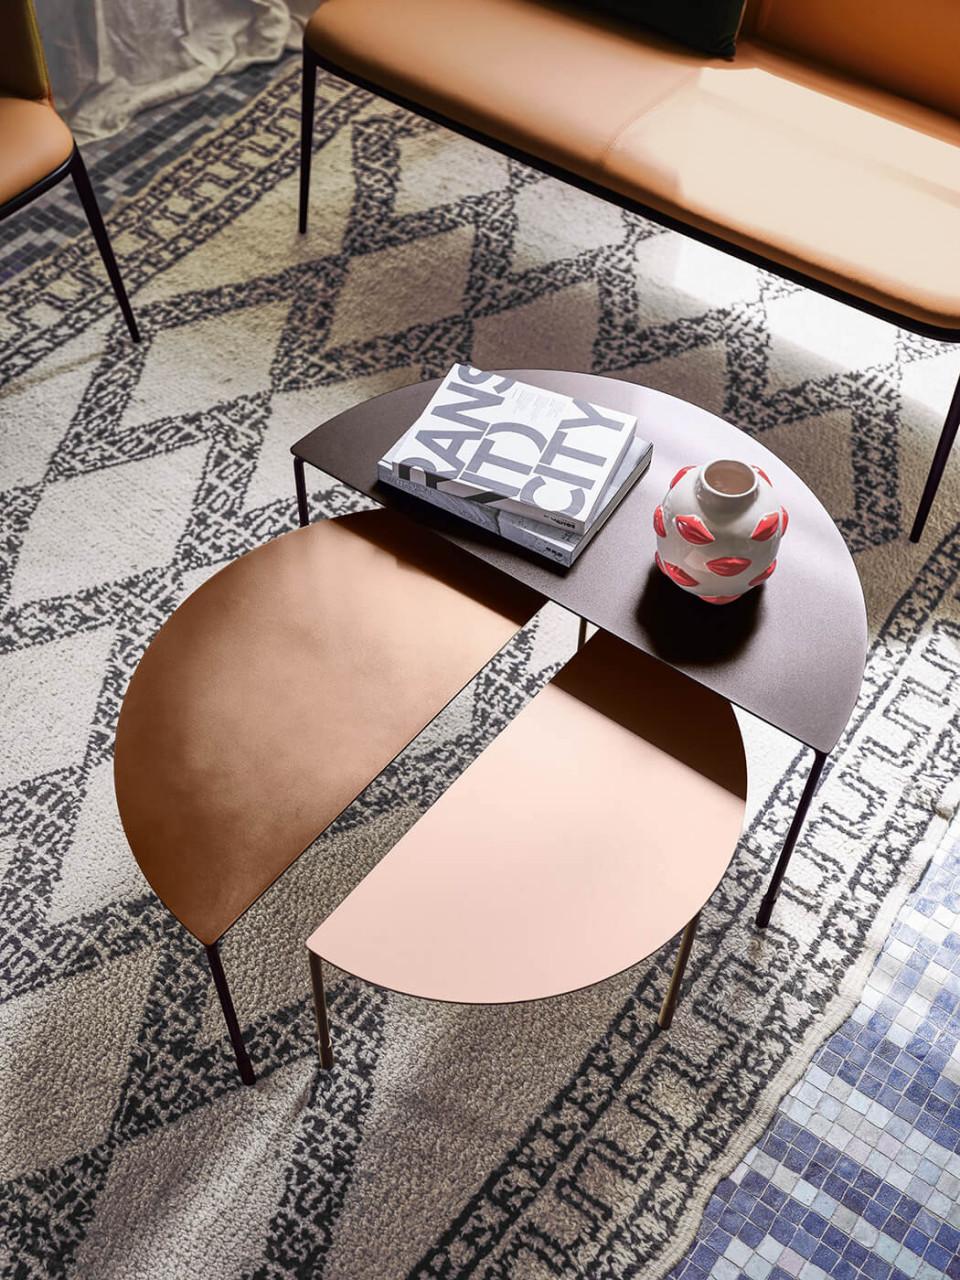 Hoodi coffe tables